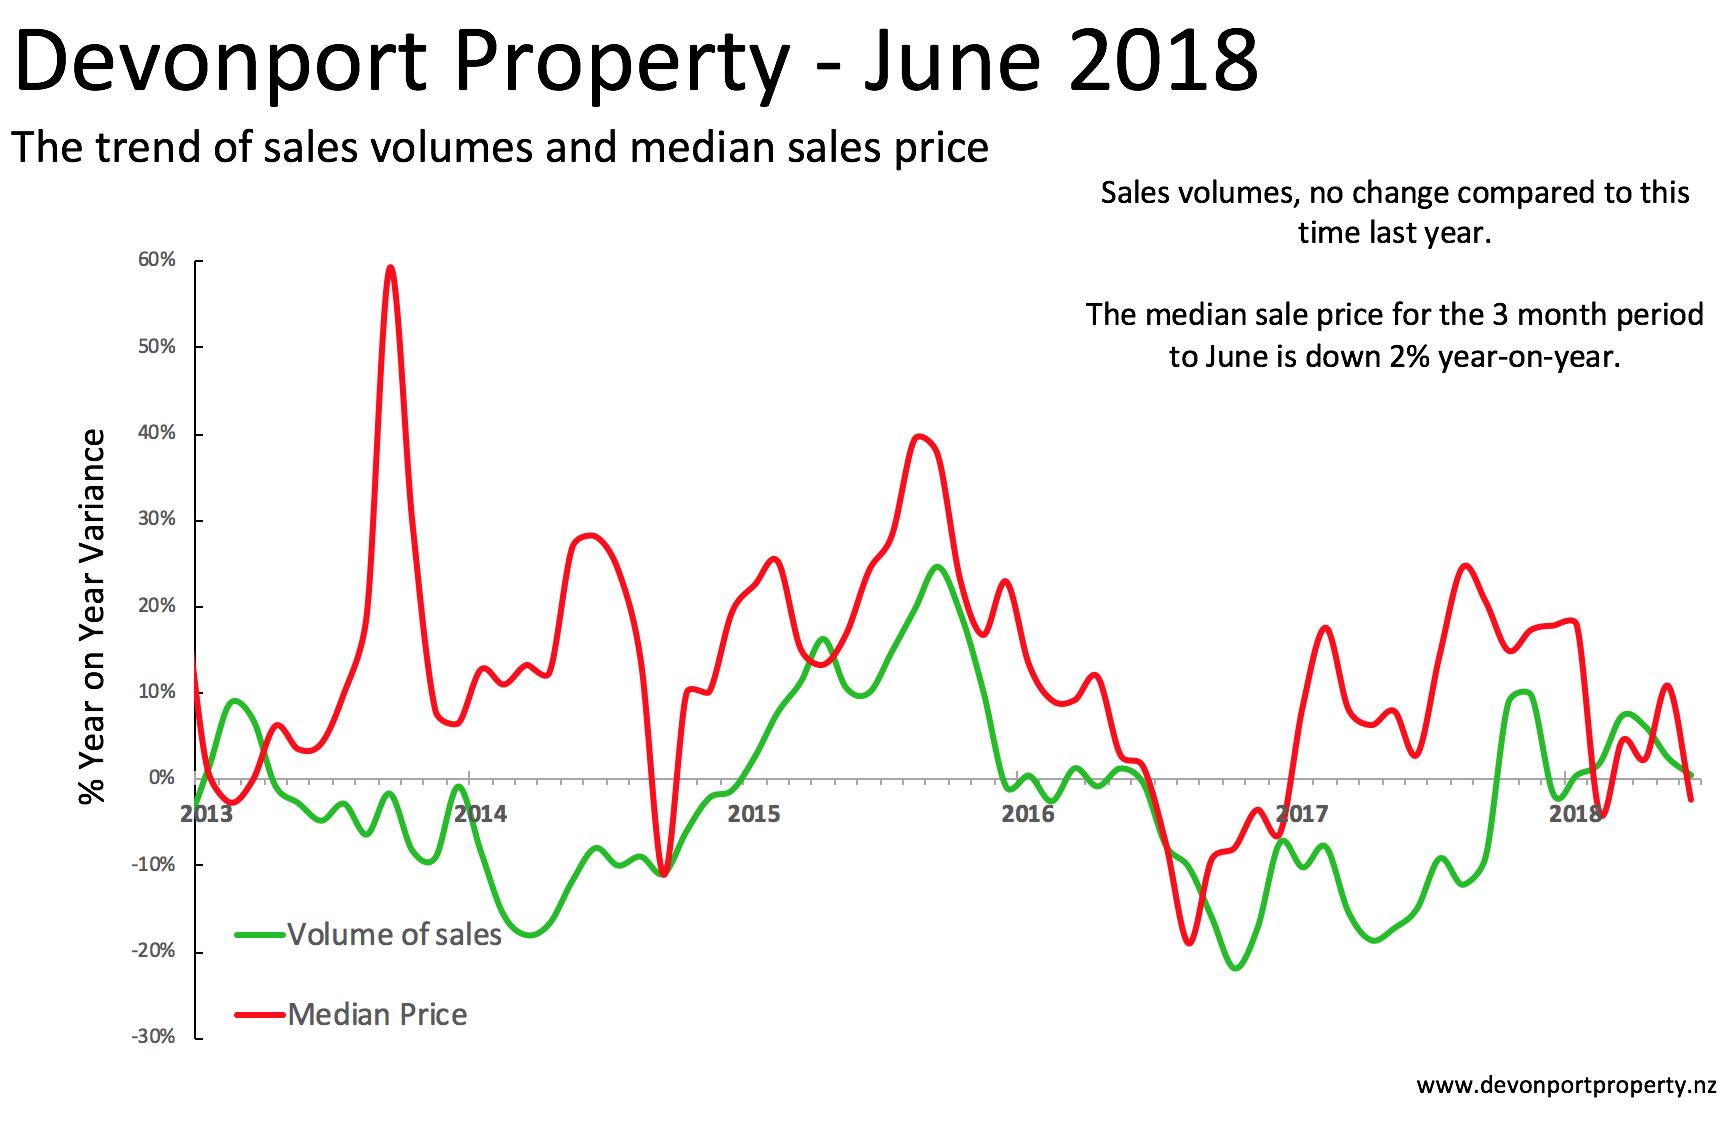 Total property in Devonport June 2018 variance of sales vol and median price.png